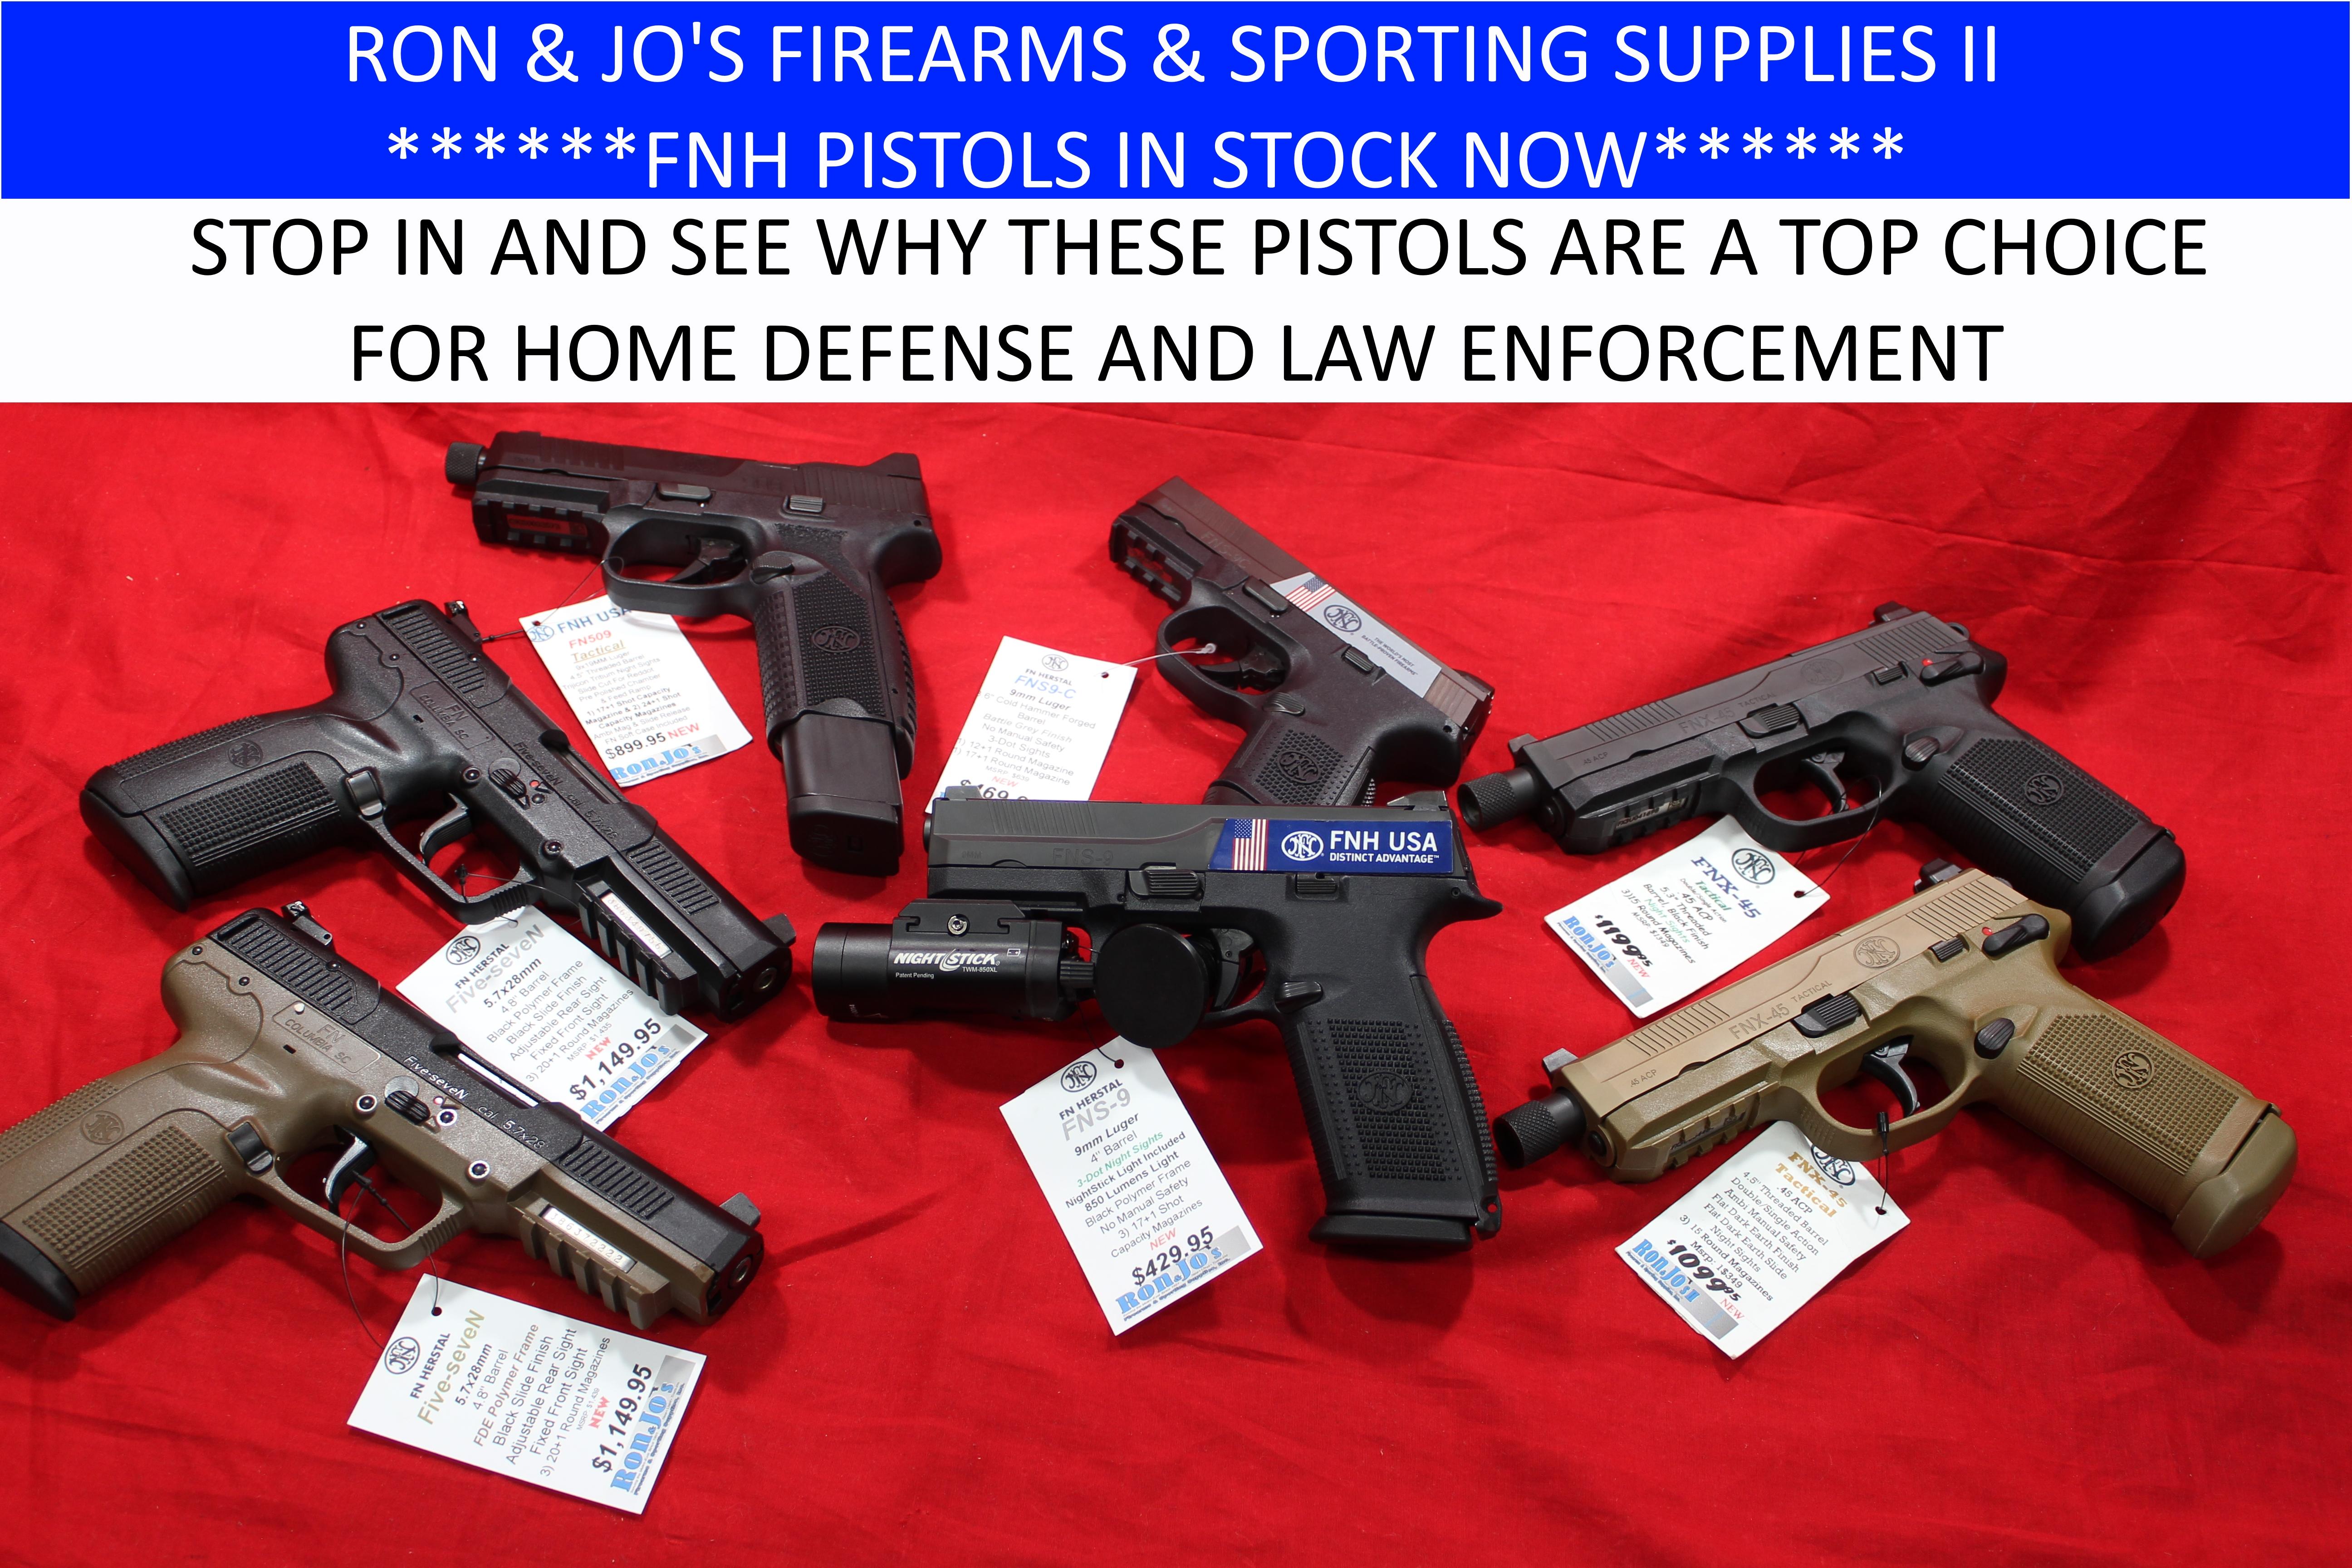 https://www.ronandjosfirearms.com/catalog/handguns/semi-automatic-handguns?brand_id=283&page=1